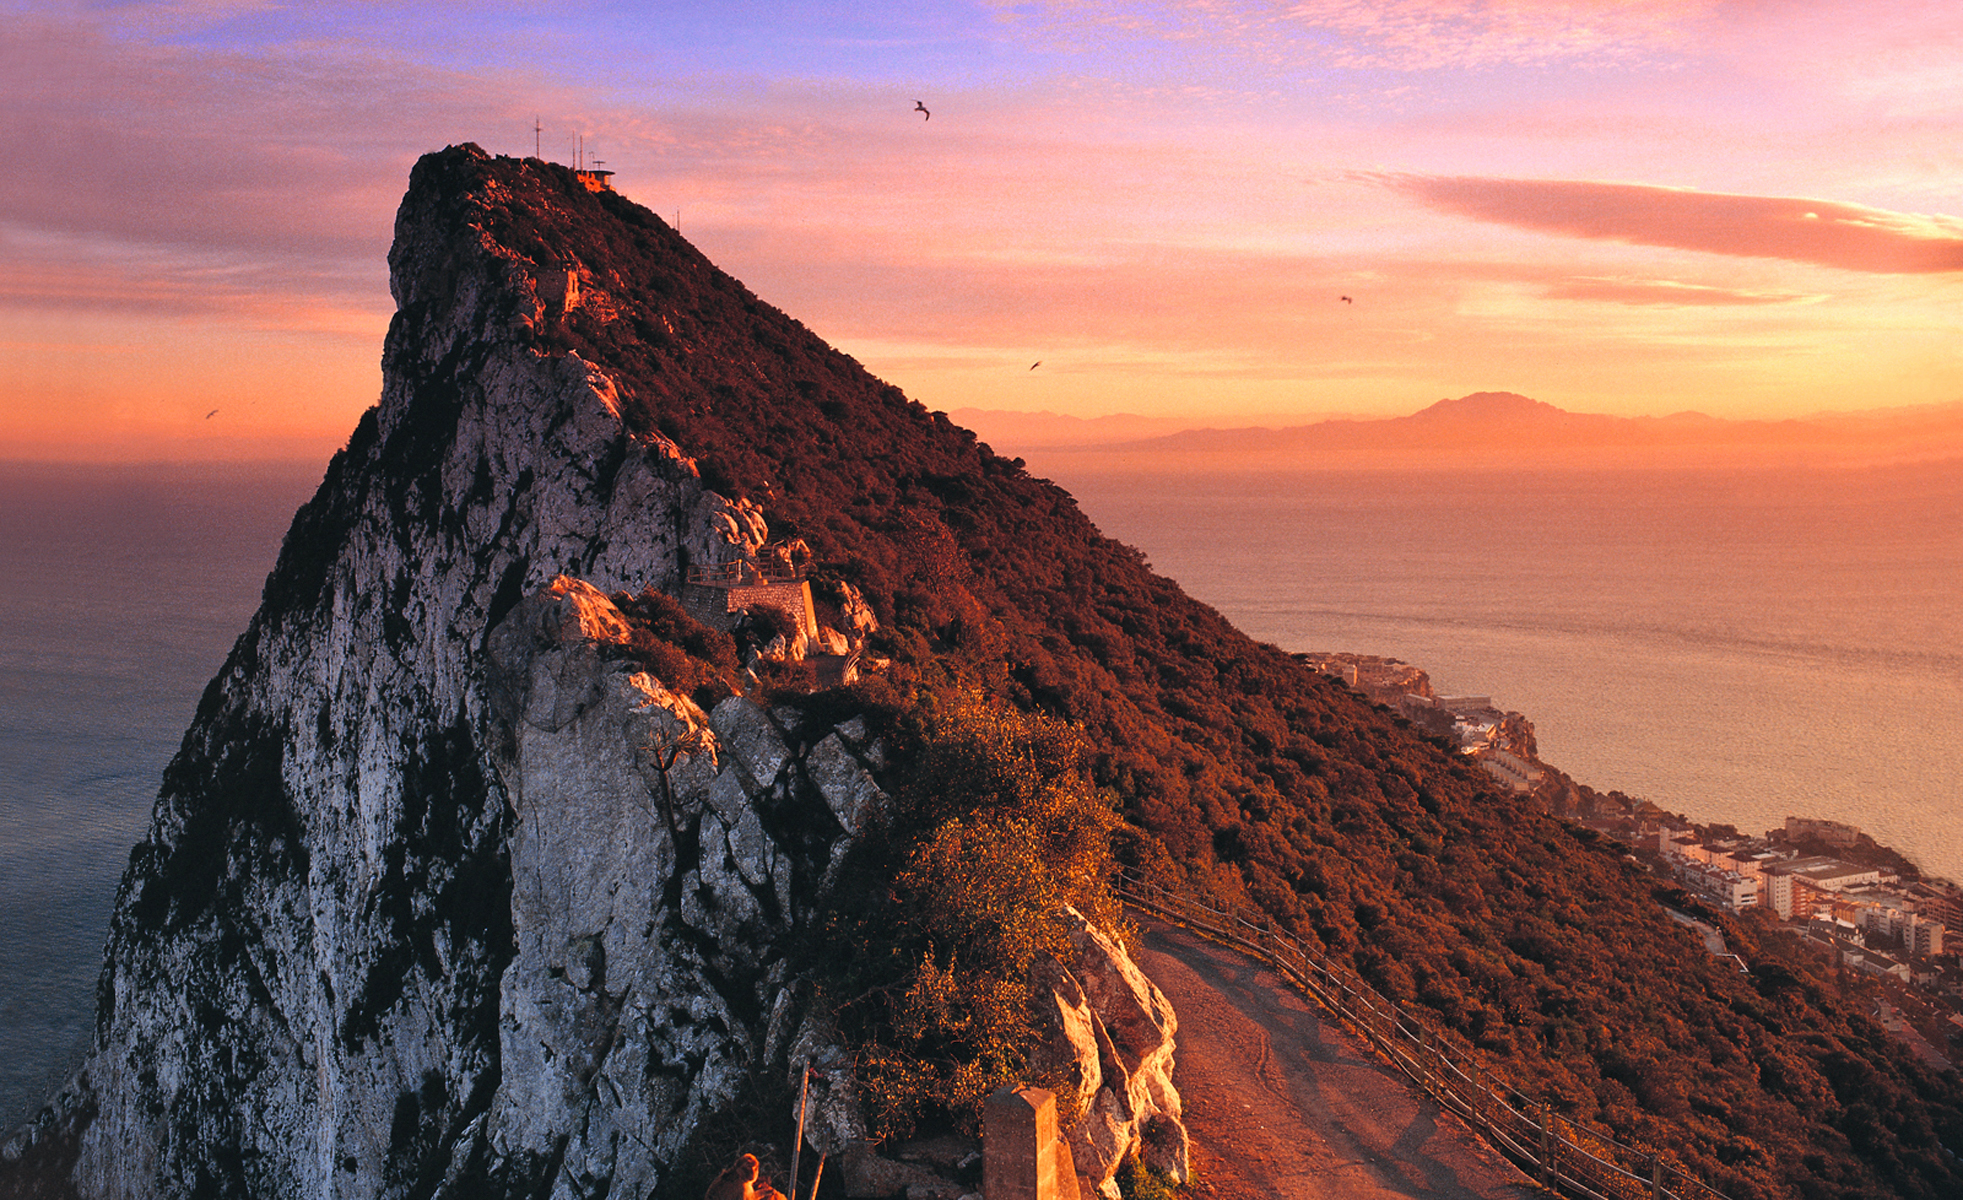 6-Rock of Gibraltar